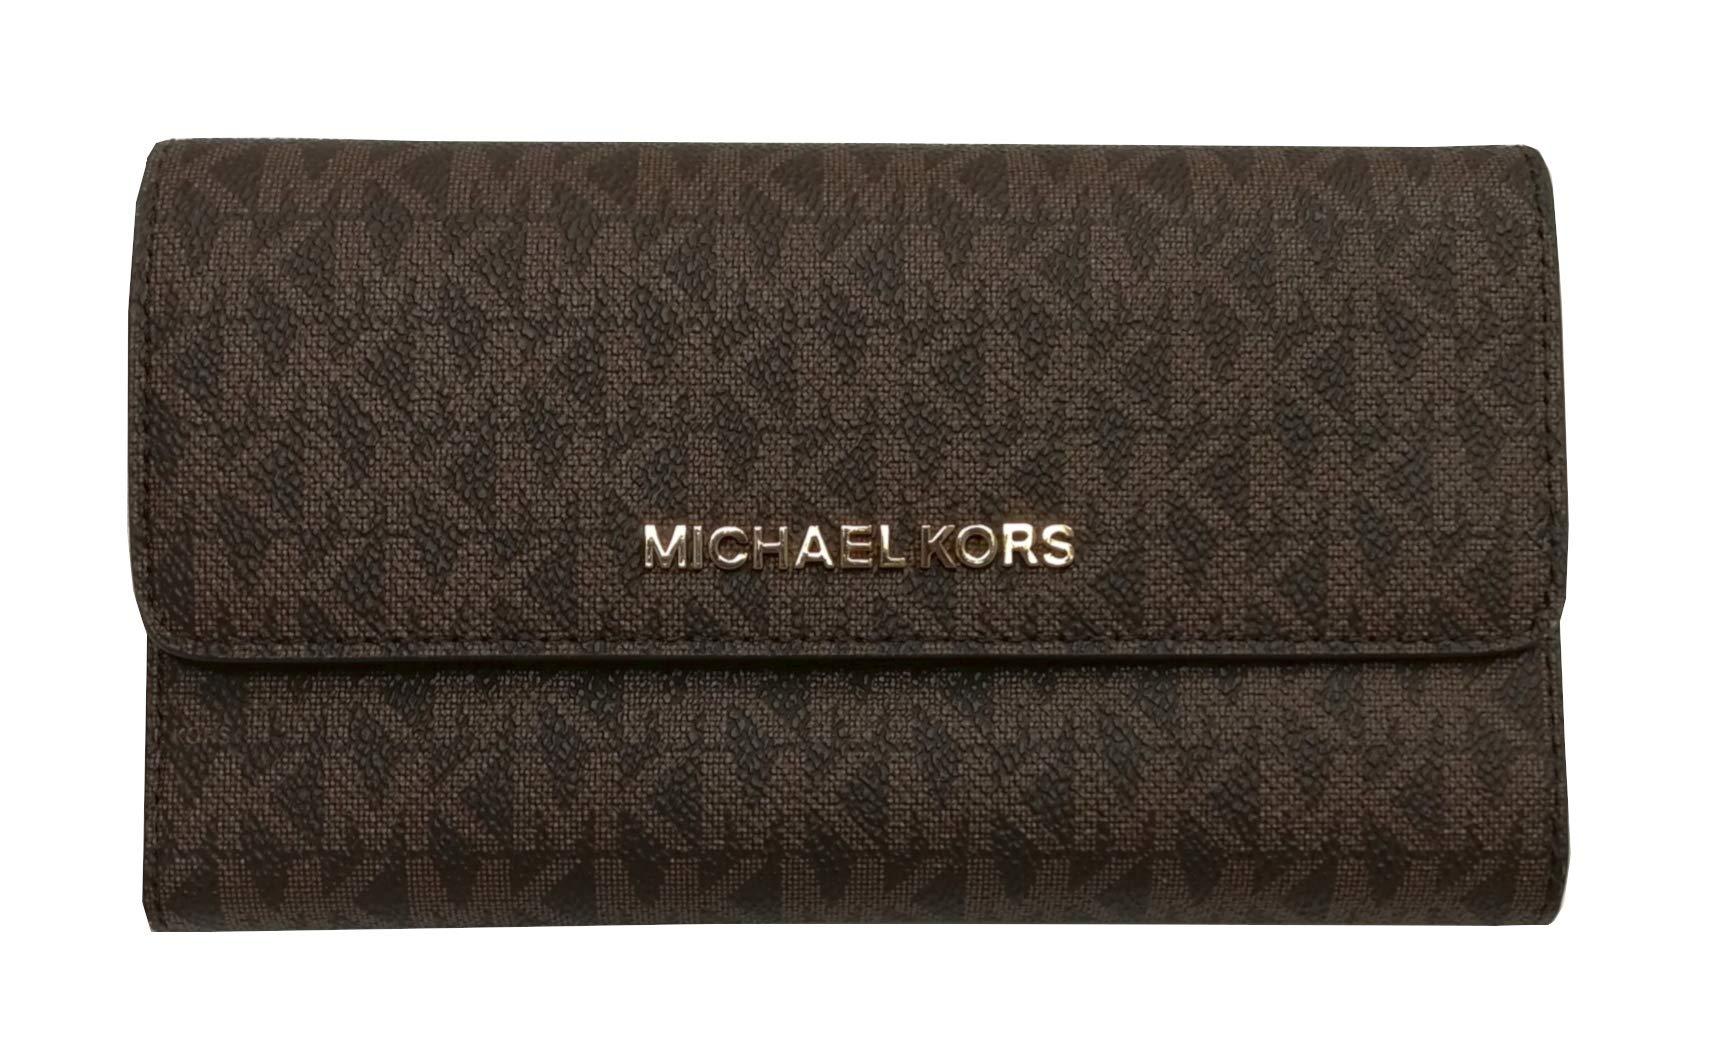 Michael Kors Jet Set Travel Large Trifold Small Signature PVC Wallet Brown Acorn